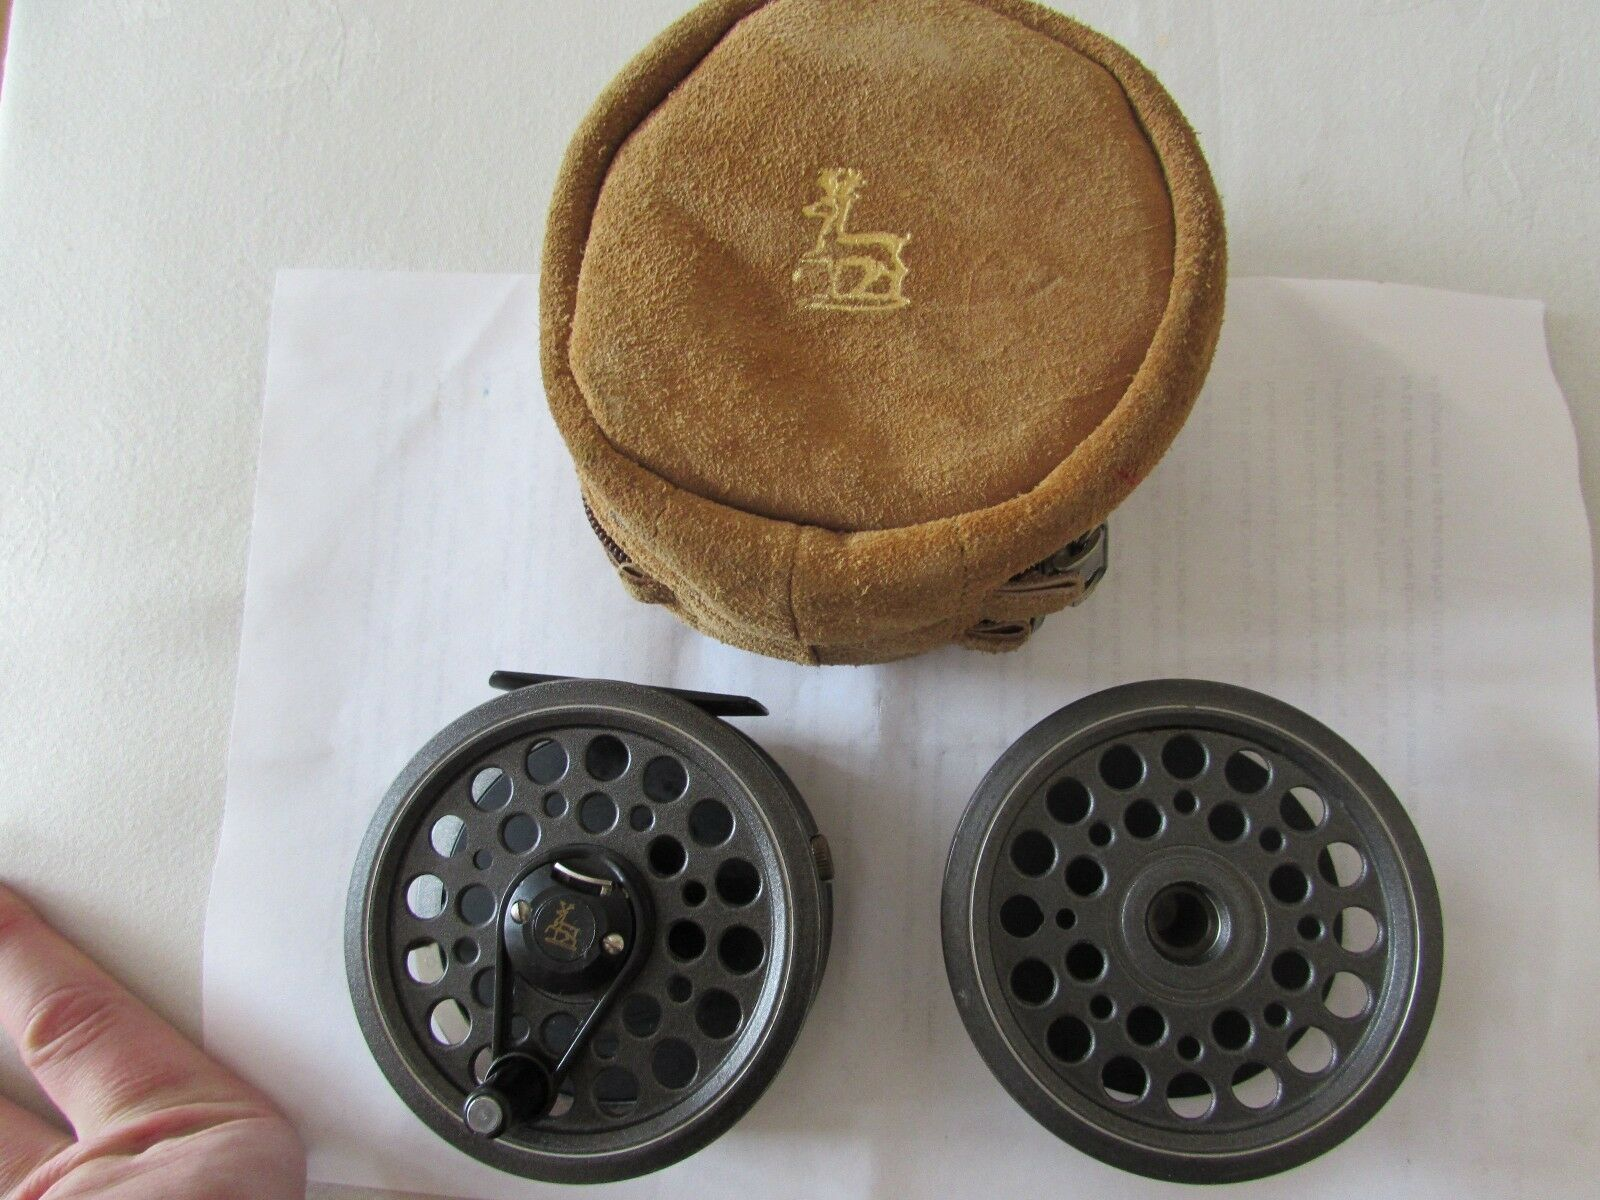 Vintage youngs shakespeare 2864 multiplier speedex fly fishing reel & spool etc